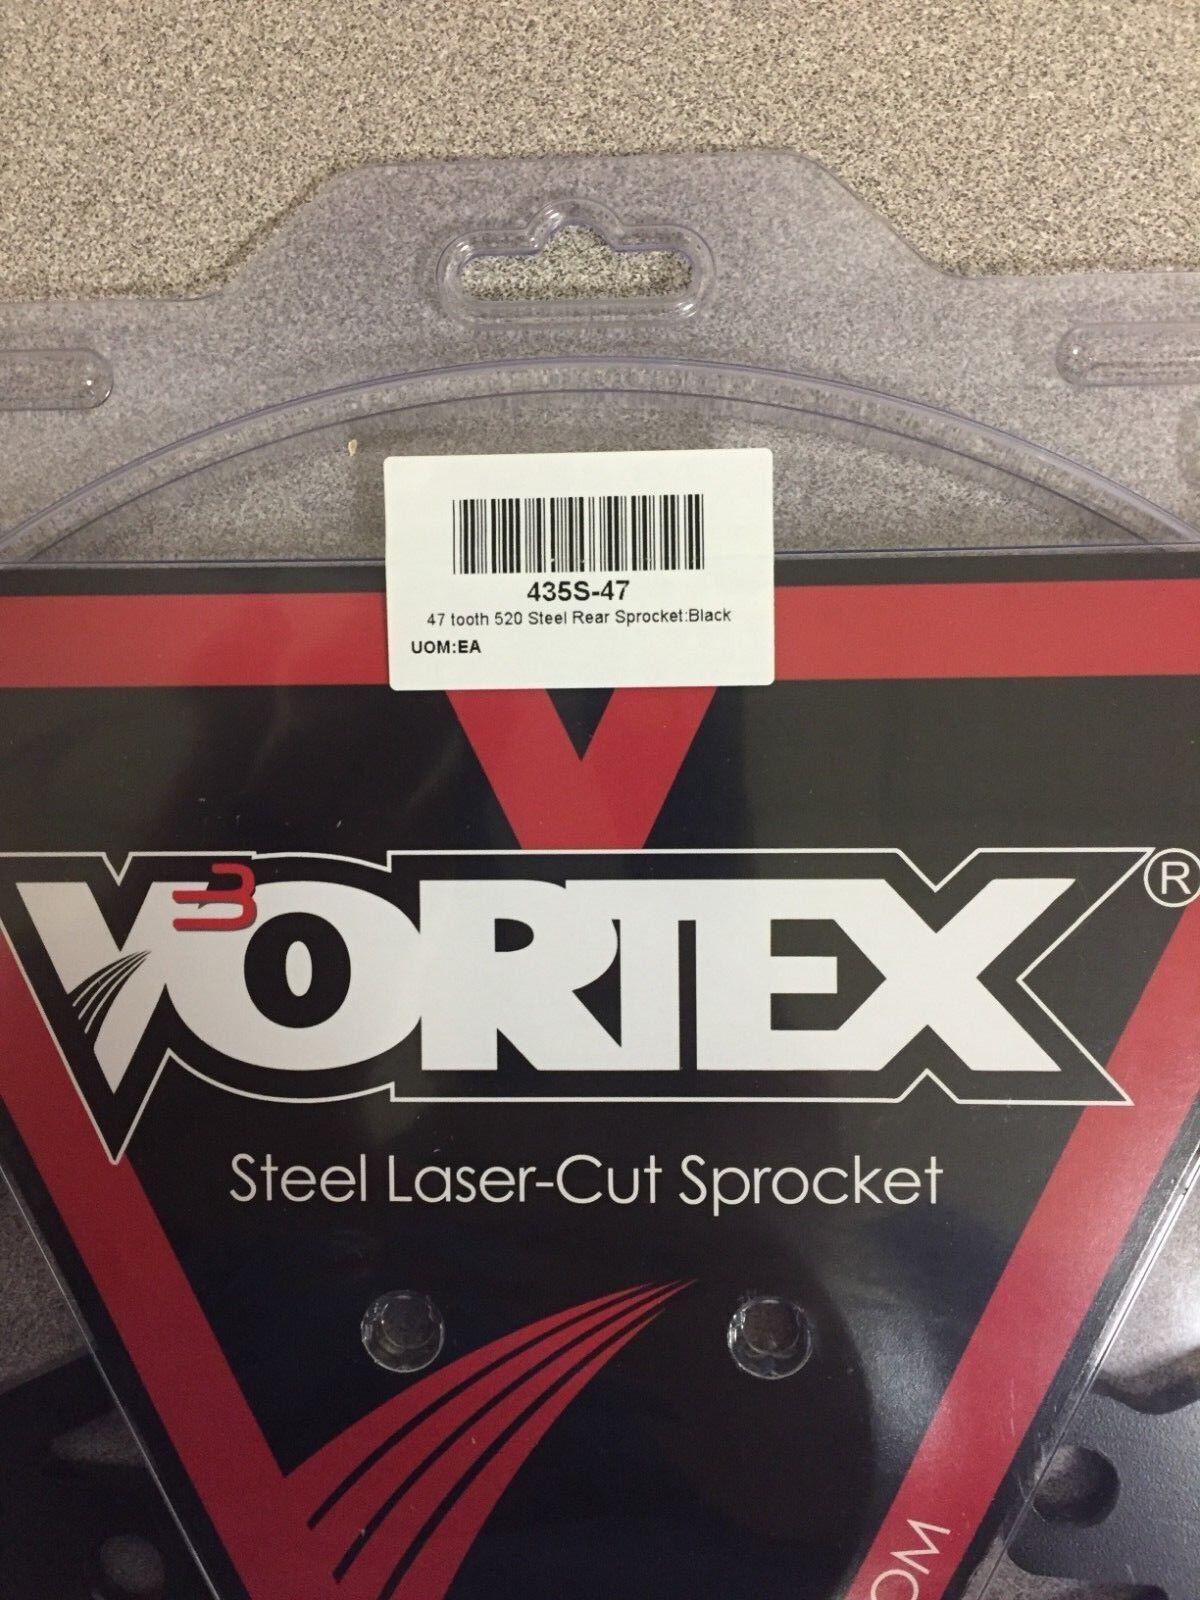 Vortex GFRS Go Fast 520 Street Chain and Sprocket Kit CK6154 16//47 YZF-R1 09-14